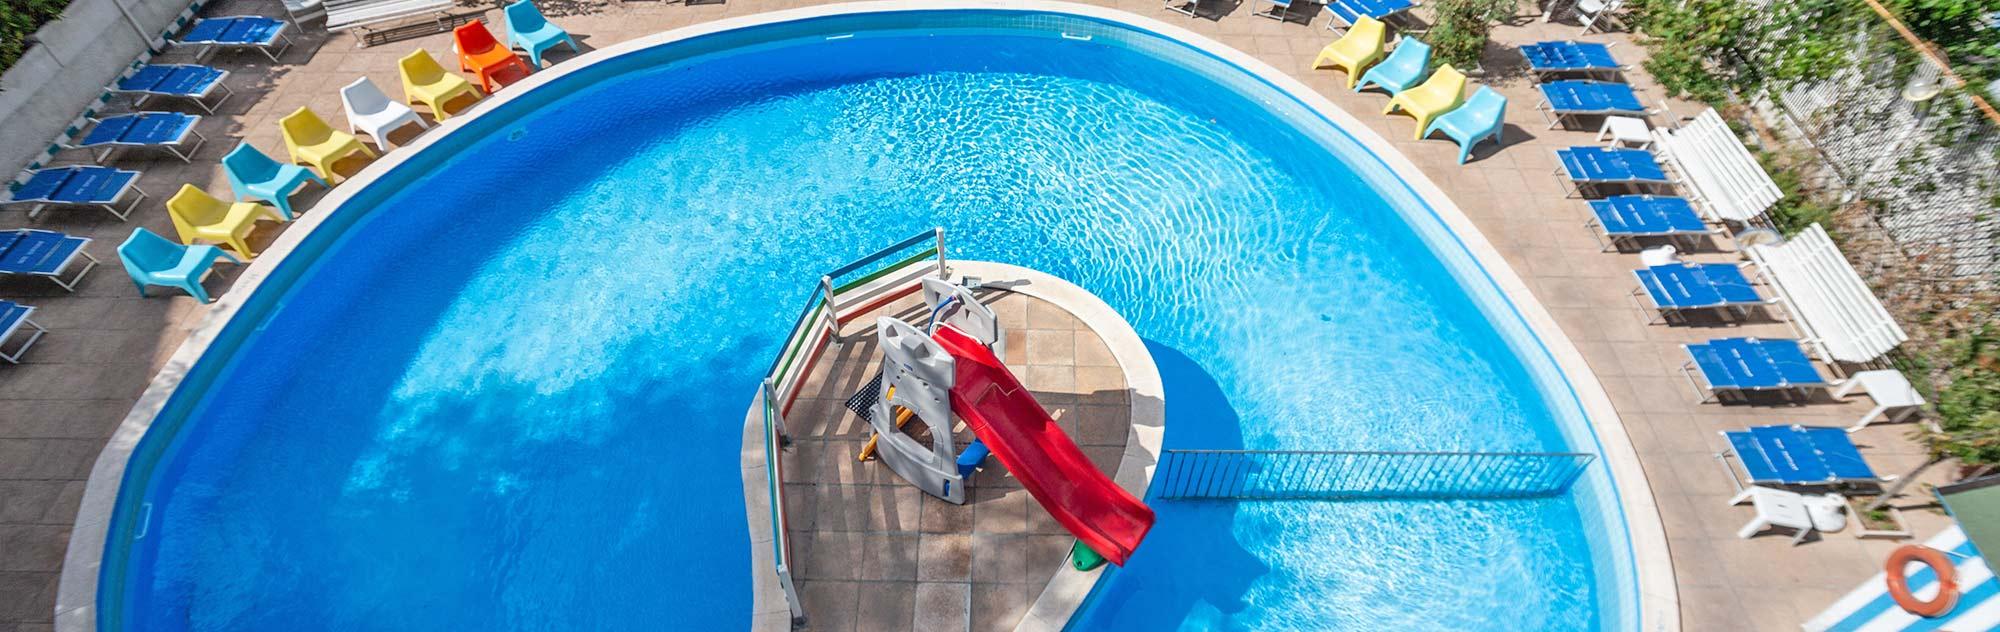 Hotel 3 stelle rivazzurra trafalgar per una vacanza - Hotel rivazzurra con piscina ...